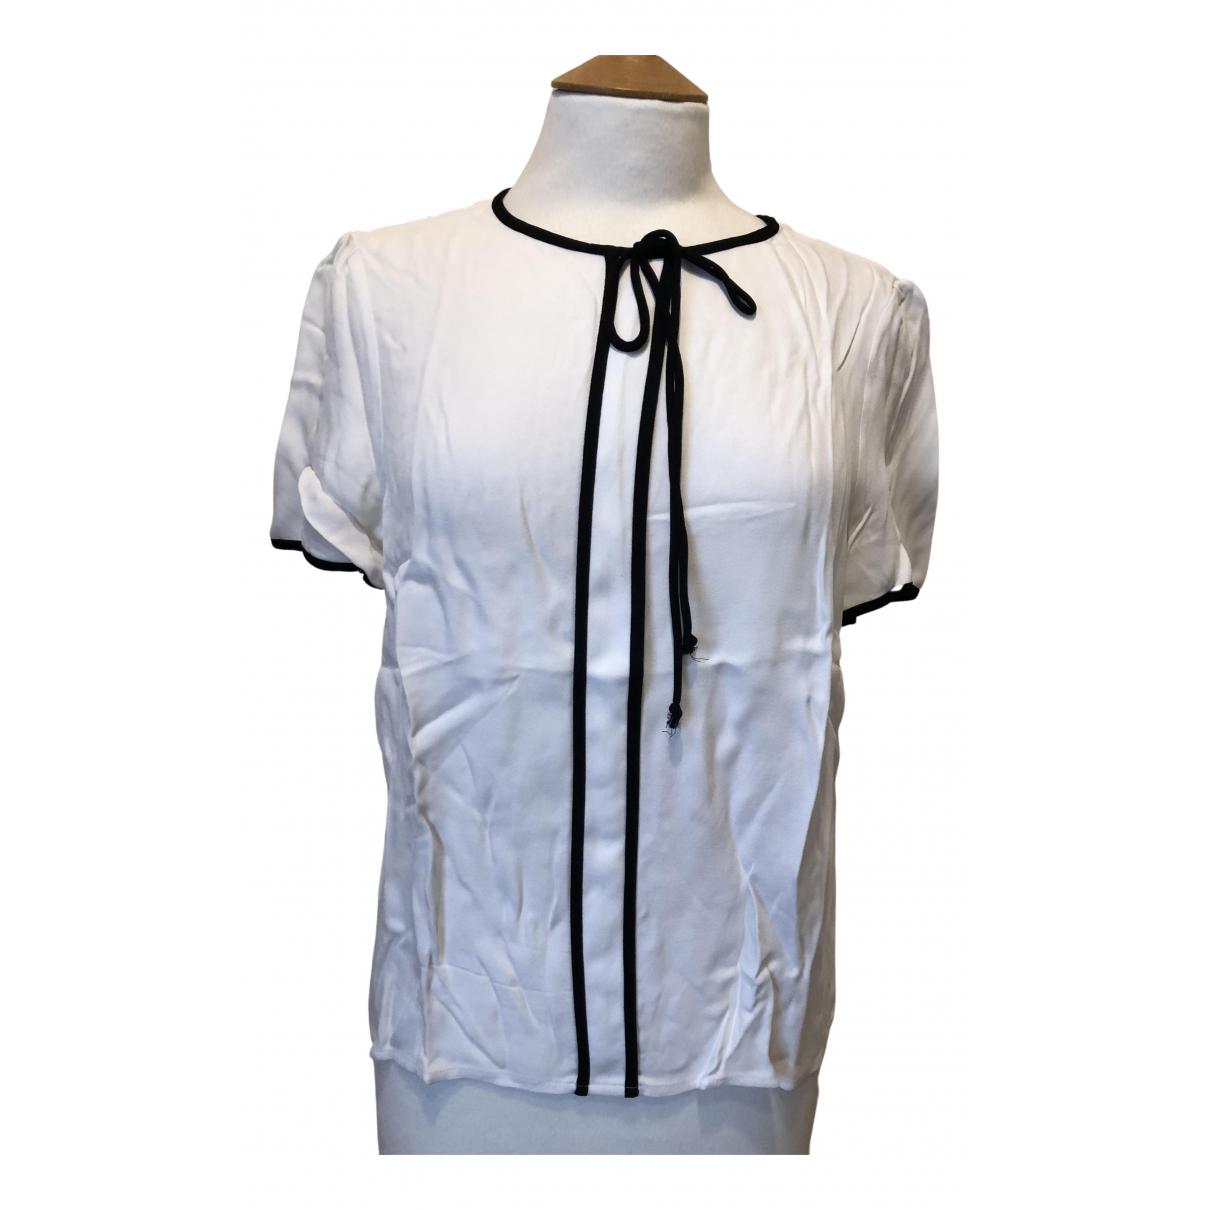 Zara - Top   pour femme - blanc